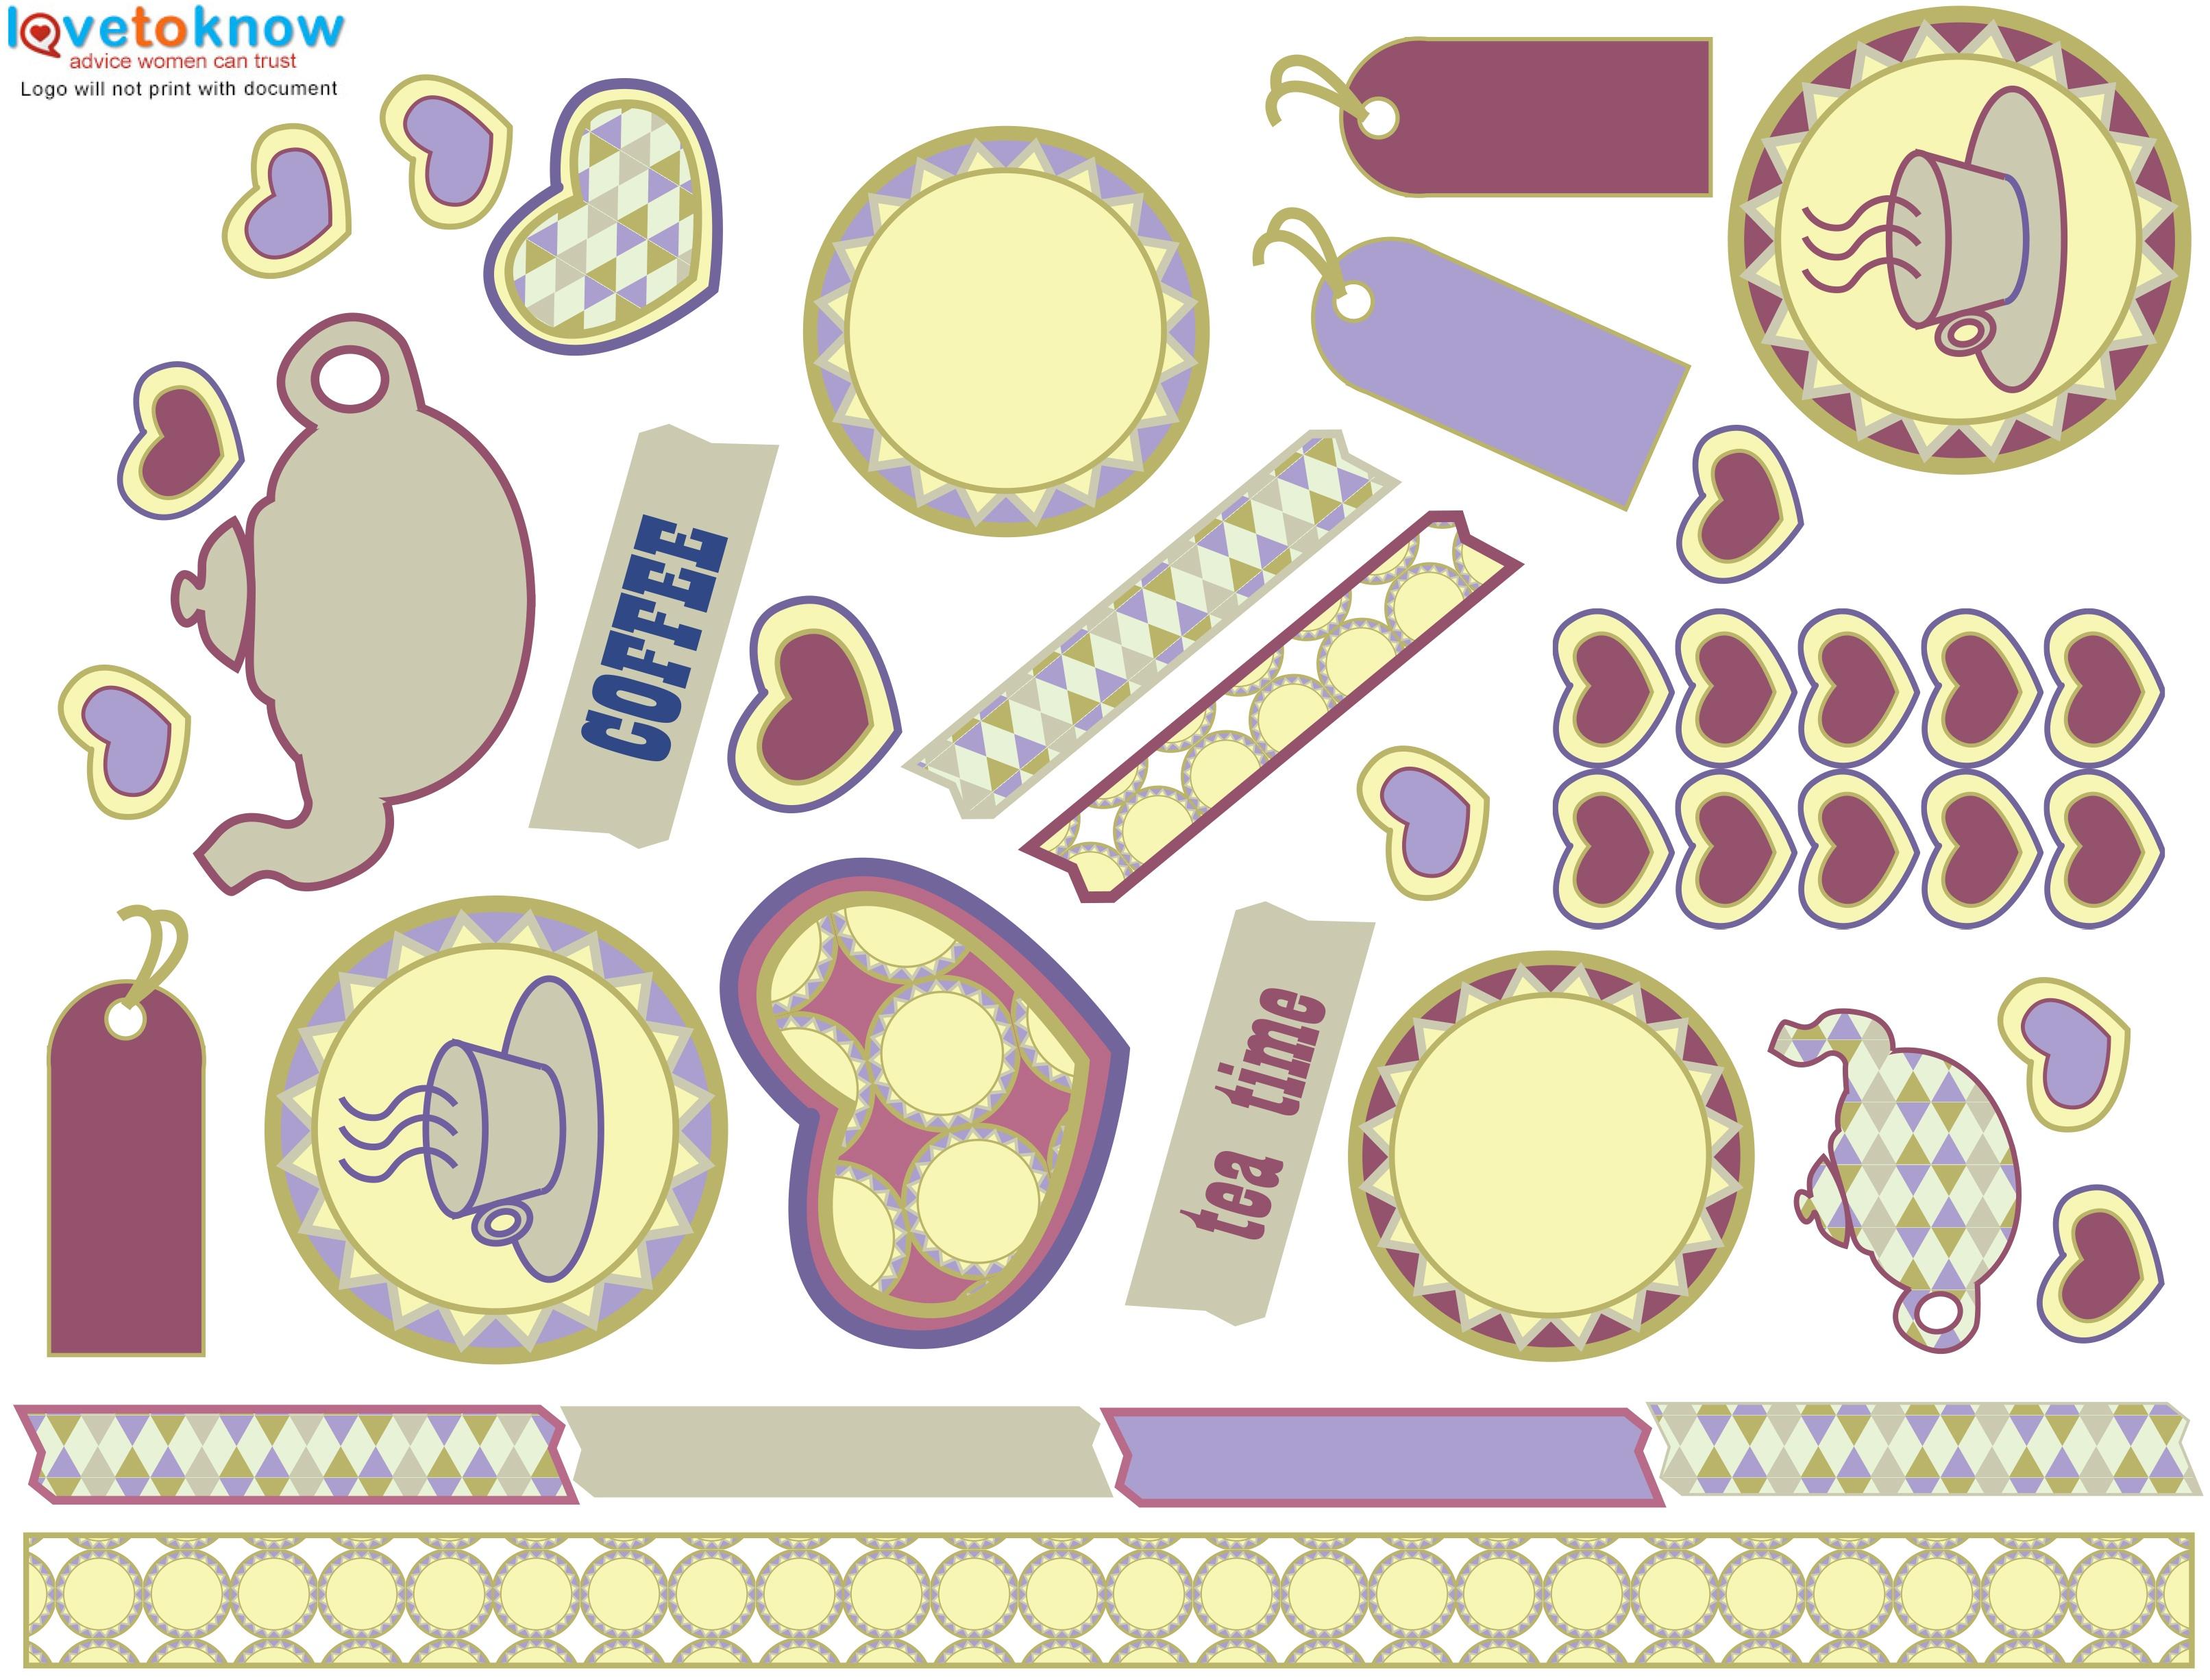 Free Printable Scrapbooking Stuff | Lovetoknow - Baby Scrapbook Templates Free Printable